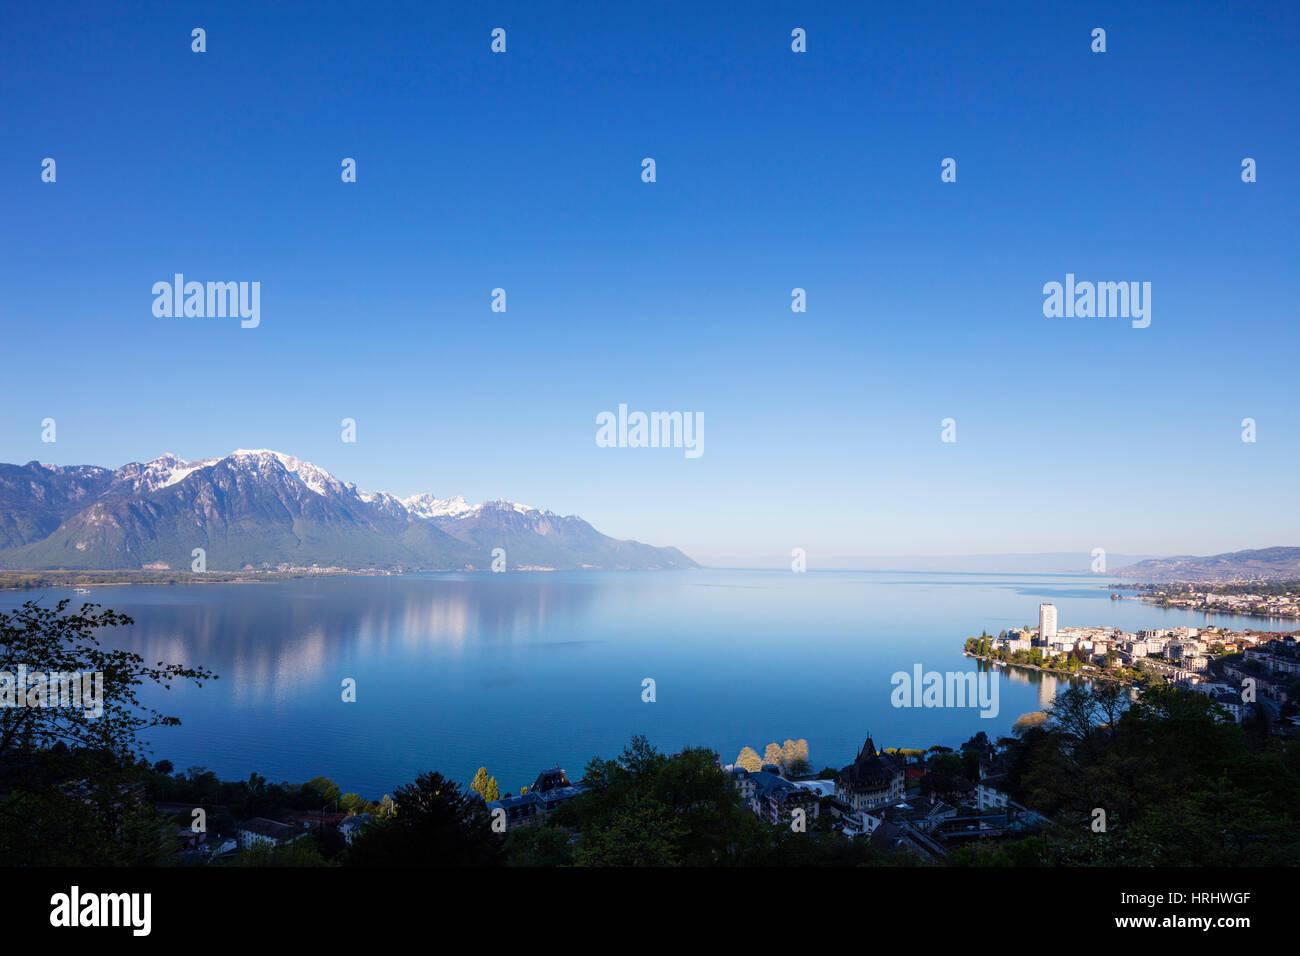 Lake Geneva (Lac Leman), Montreux, Vaud, Switzerland - Stock Image